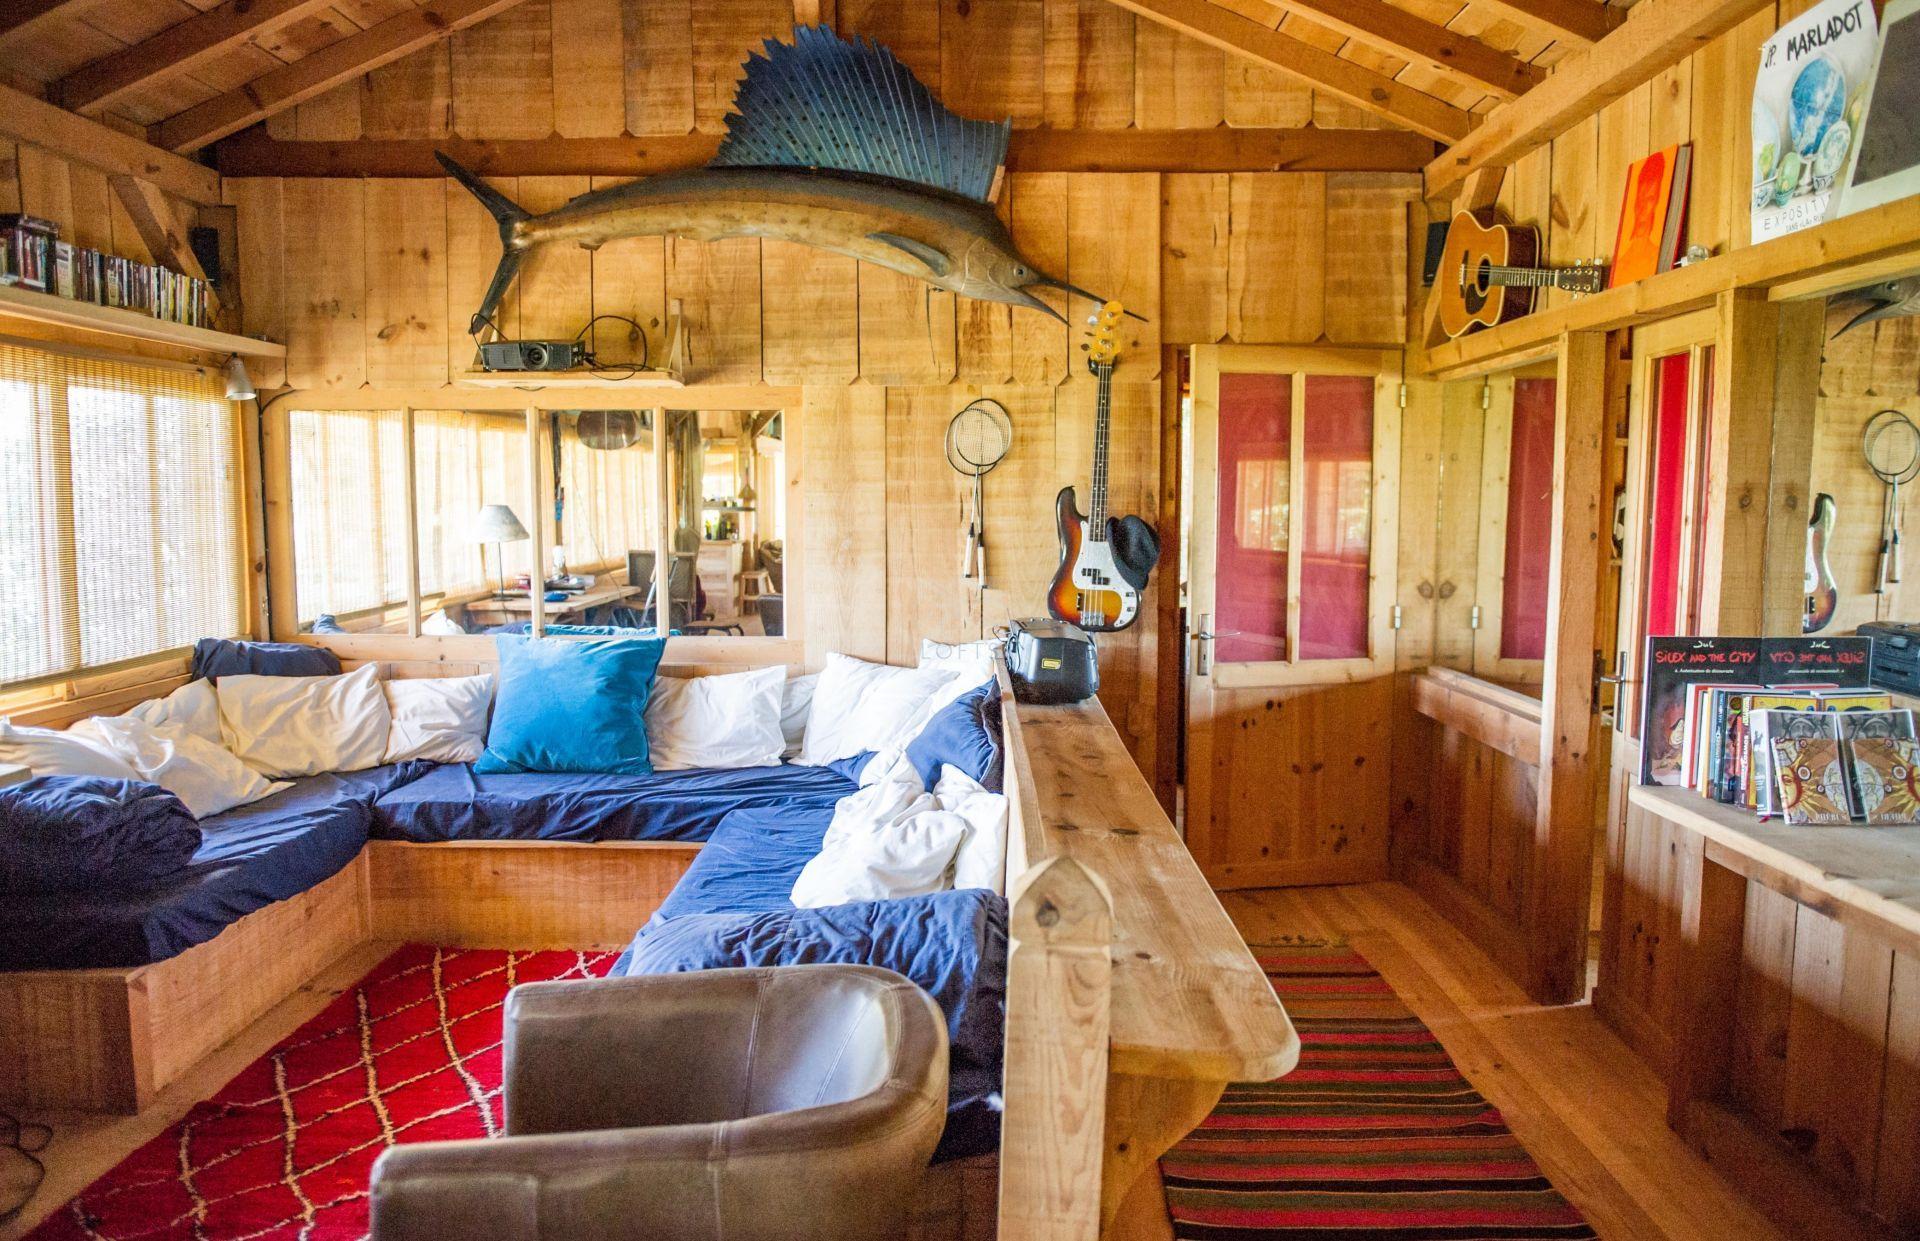 location saison cabane bartherotte en bois au cap ferret. Black Bedroom Furniture Sets. Home Design Ideas